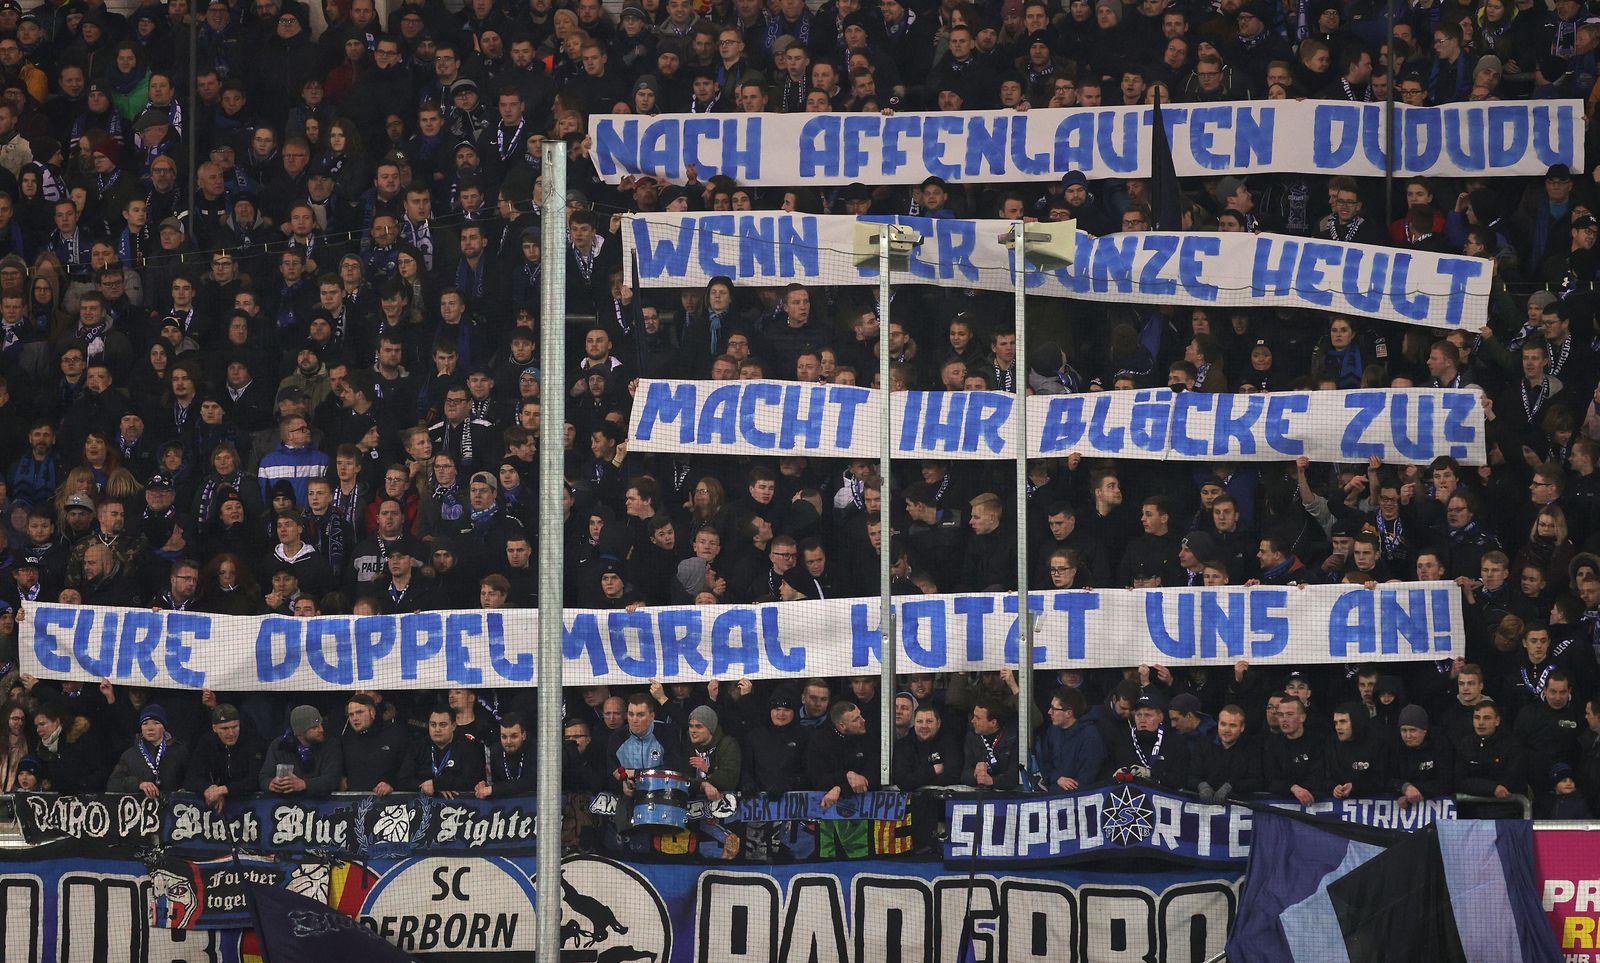 SC Paderborn vs FC Koeln, Germany - 06 Mar 2020